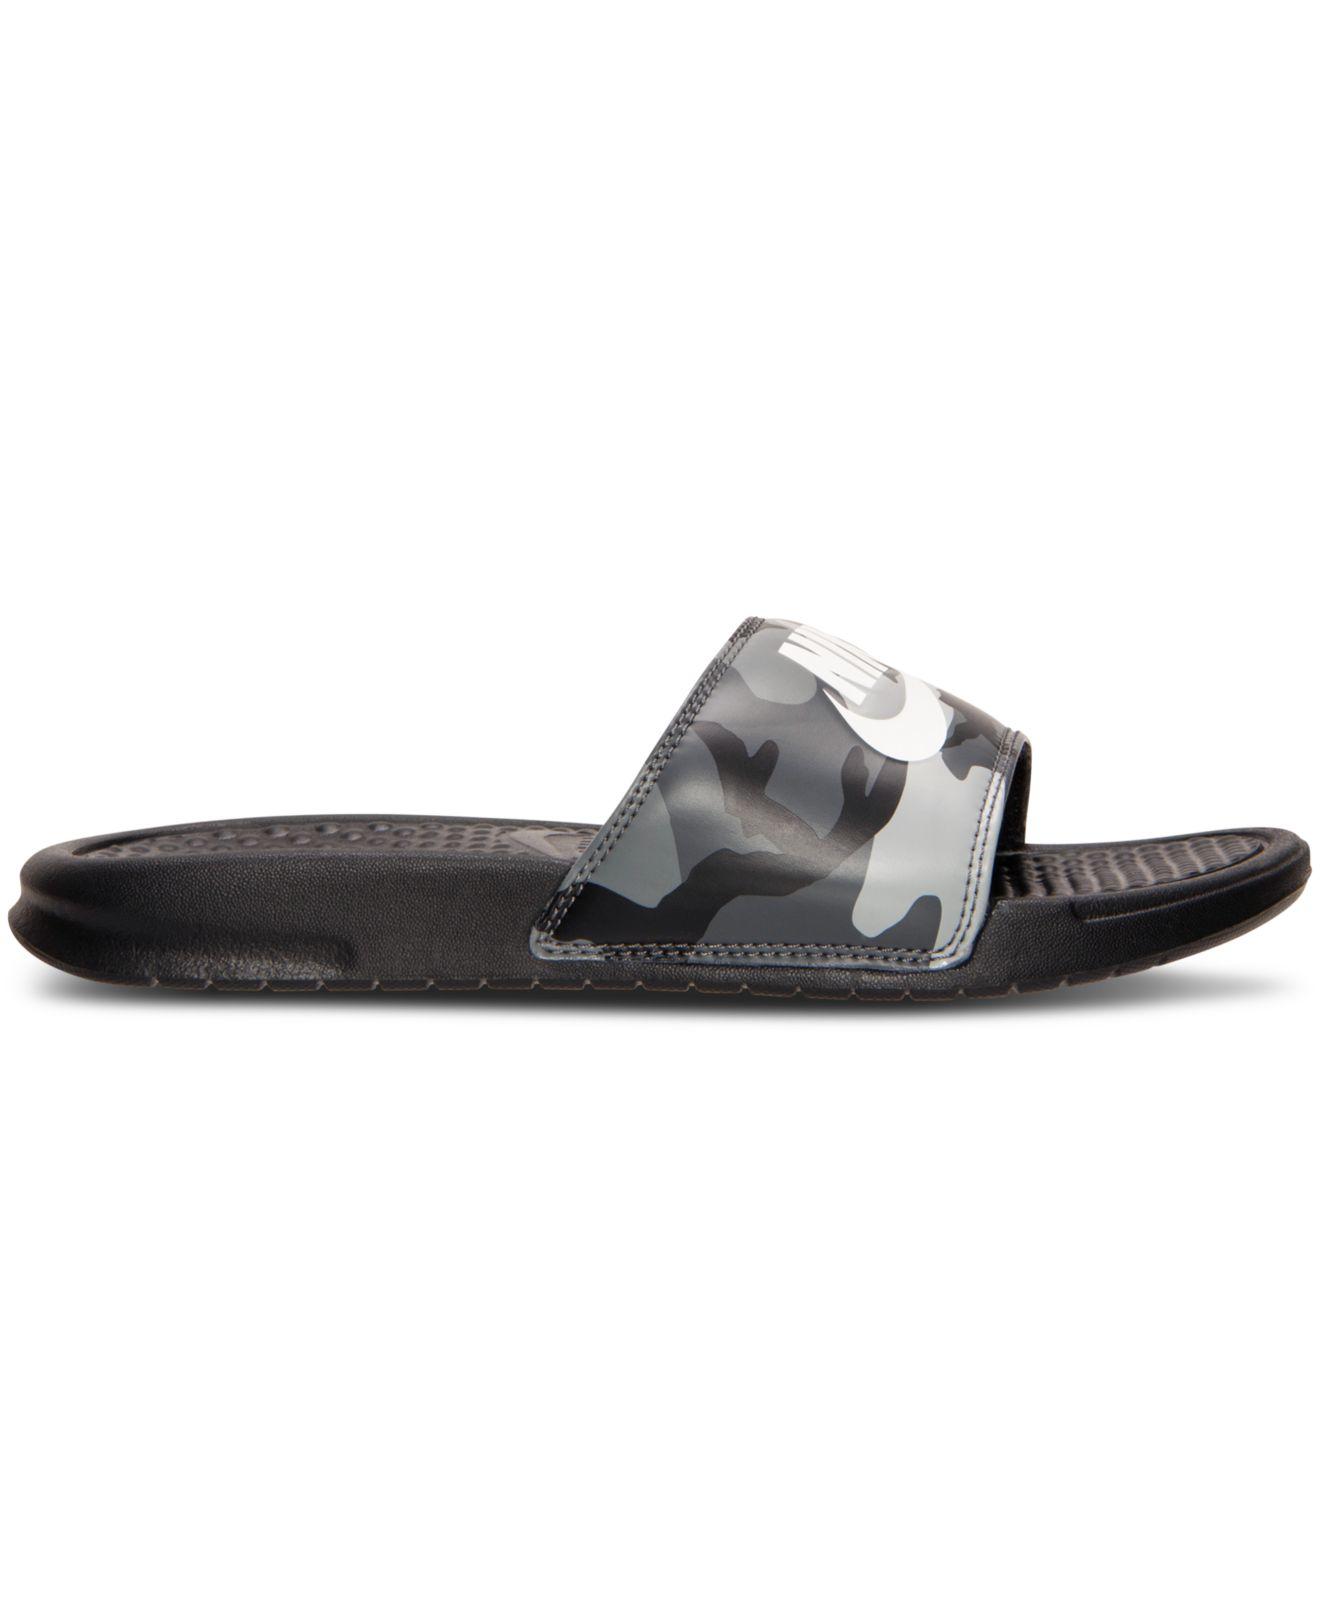 8393784e27ad8 Lyst - Nike Men s Benassi Jdi Print Slide Sandals From Finish Line ...